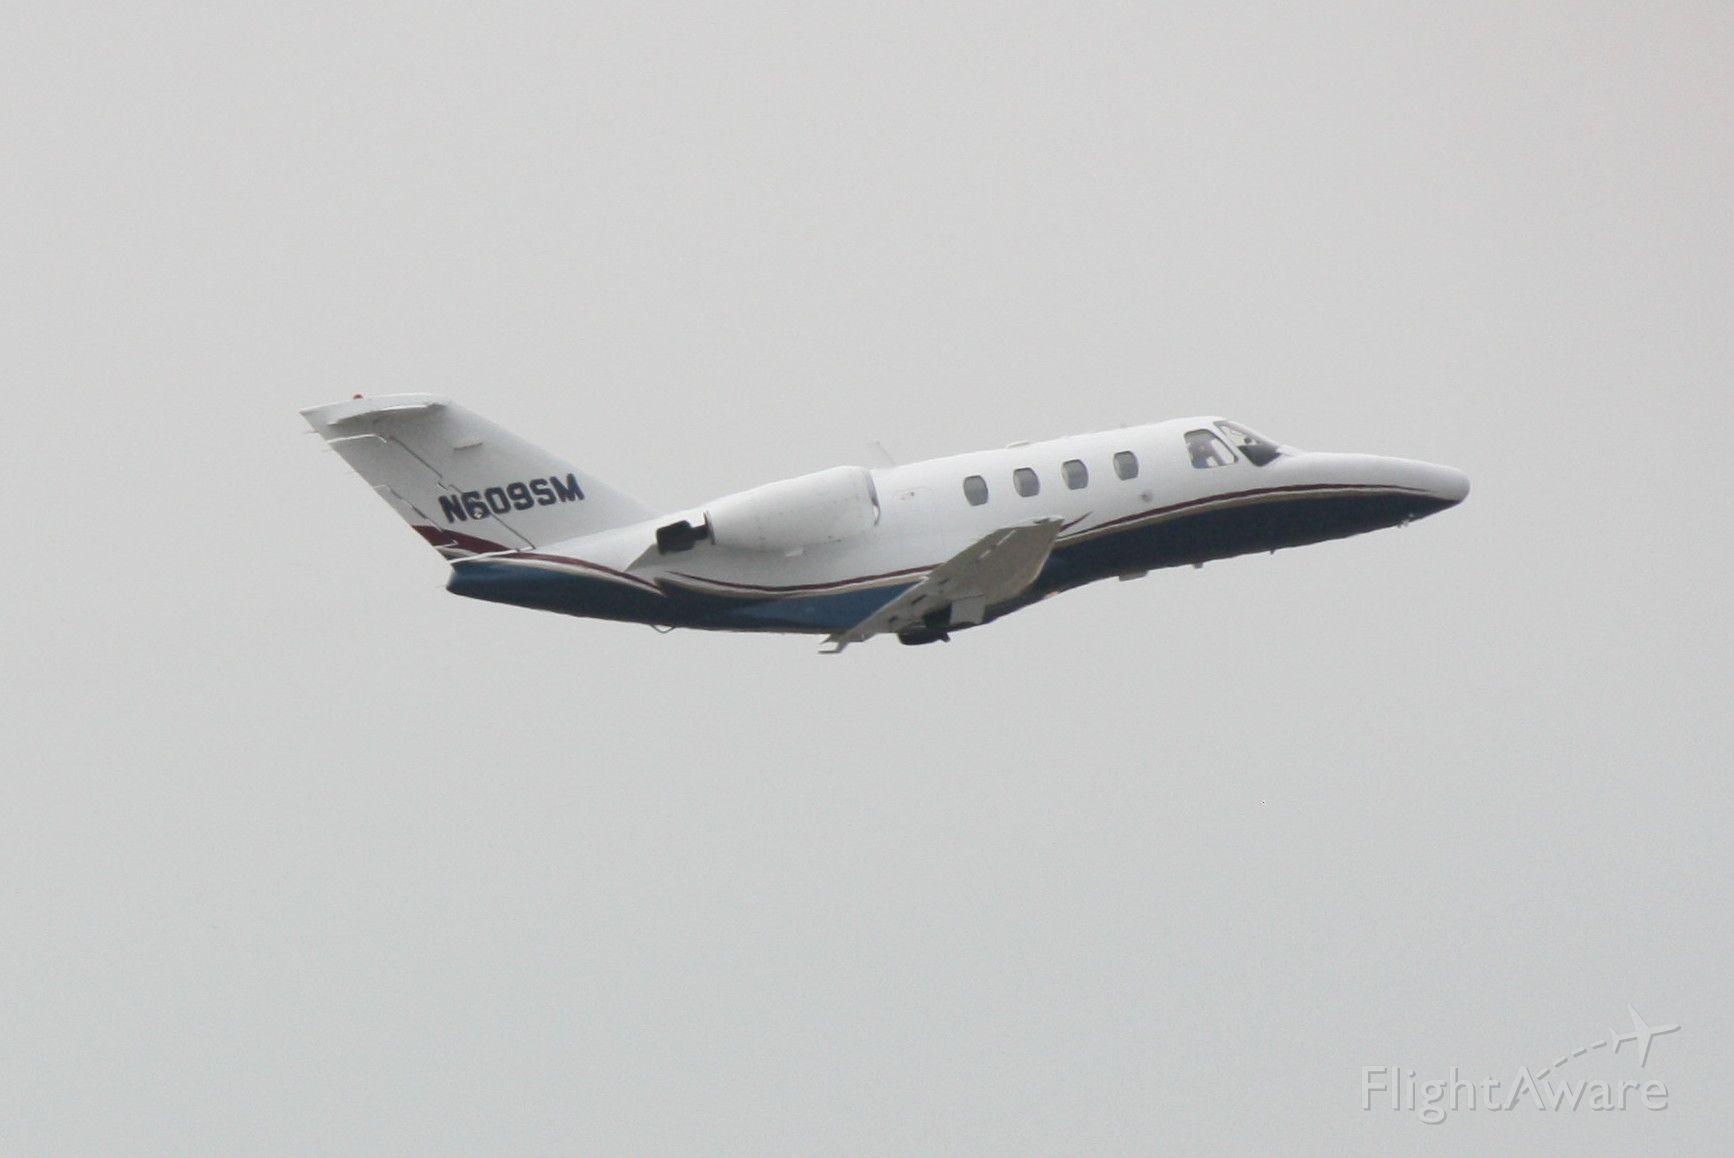 Cessna Citation CJ1 (N609SM) - Cessna Citation I (N609SM) departs Sarasota-Bradenton International Airport enroute to Savannah Airport